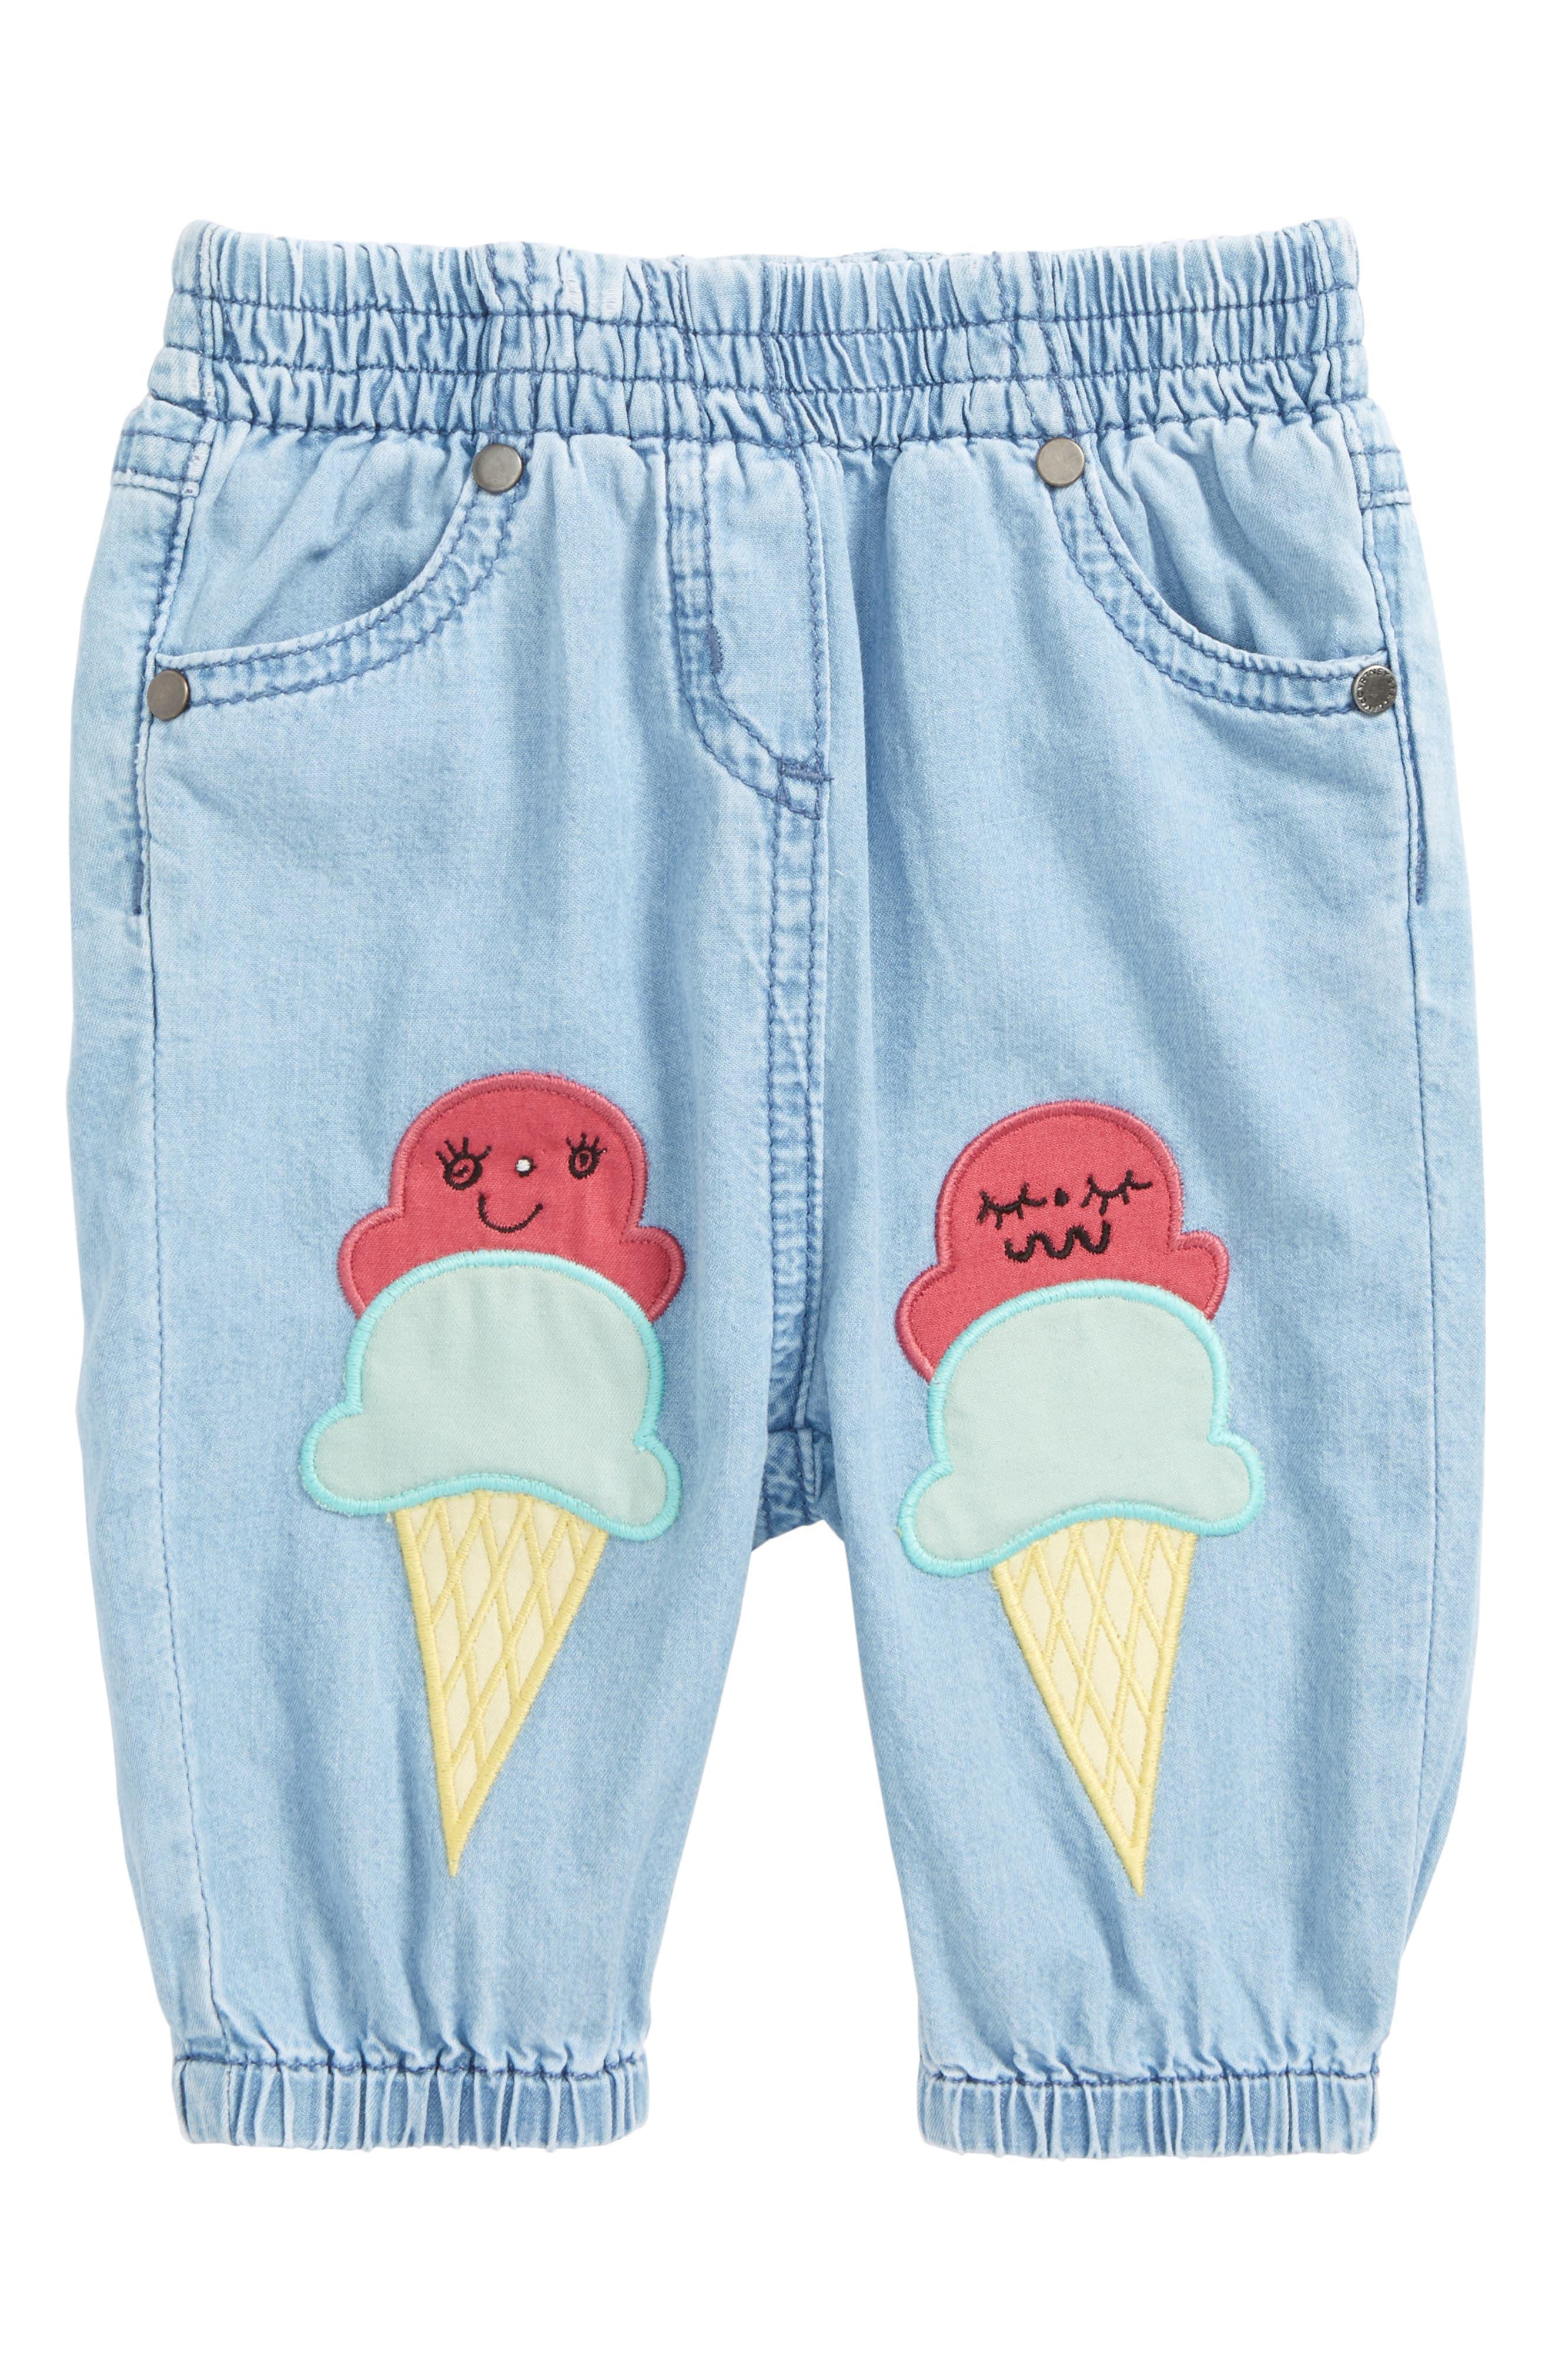 Pipkin Chambray Pants,                         Main,                         color, Denim